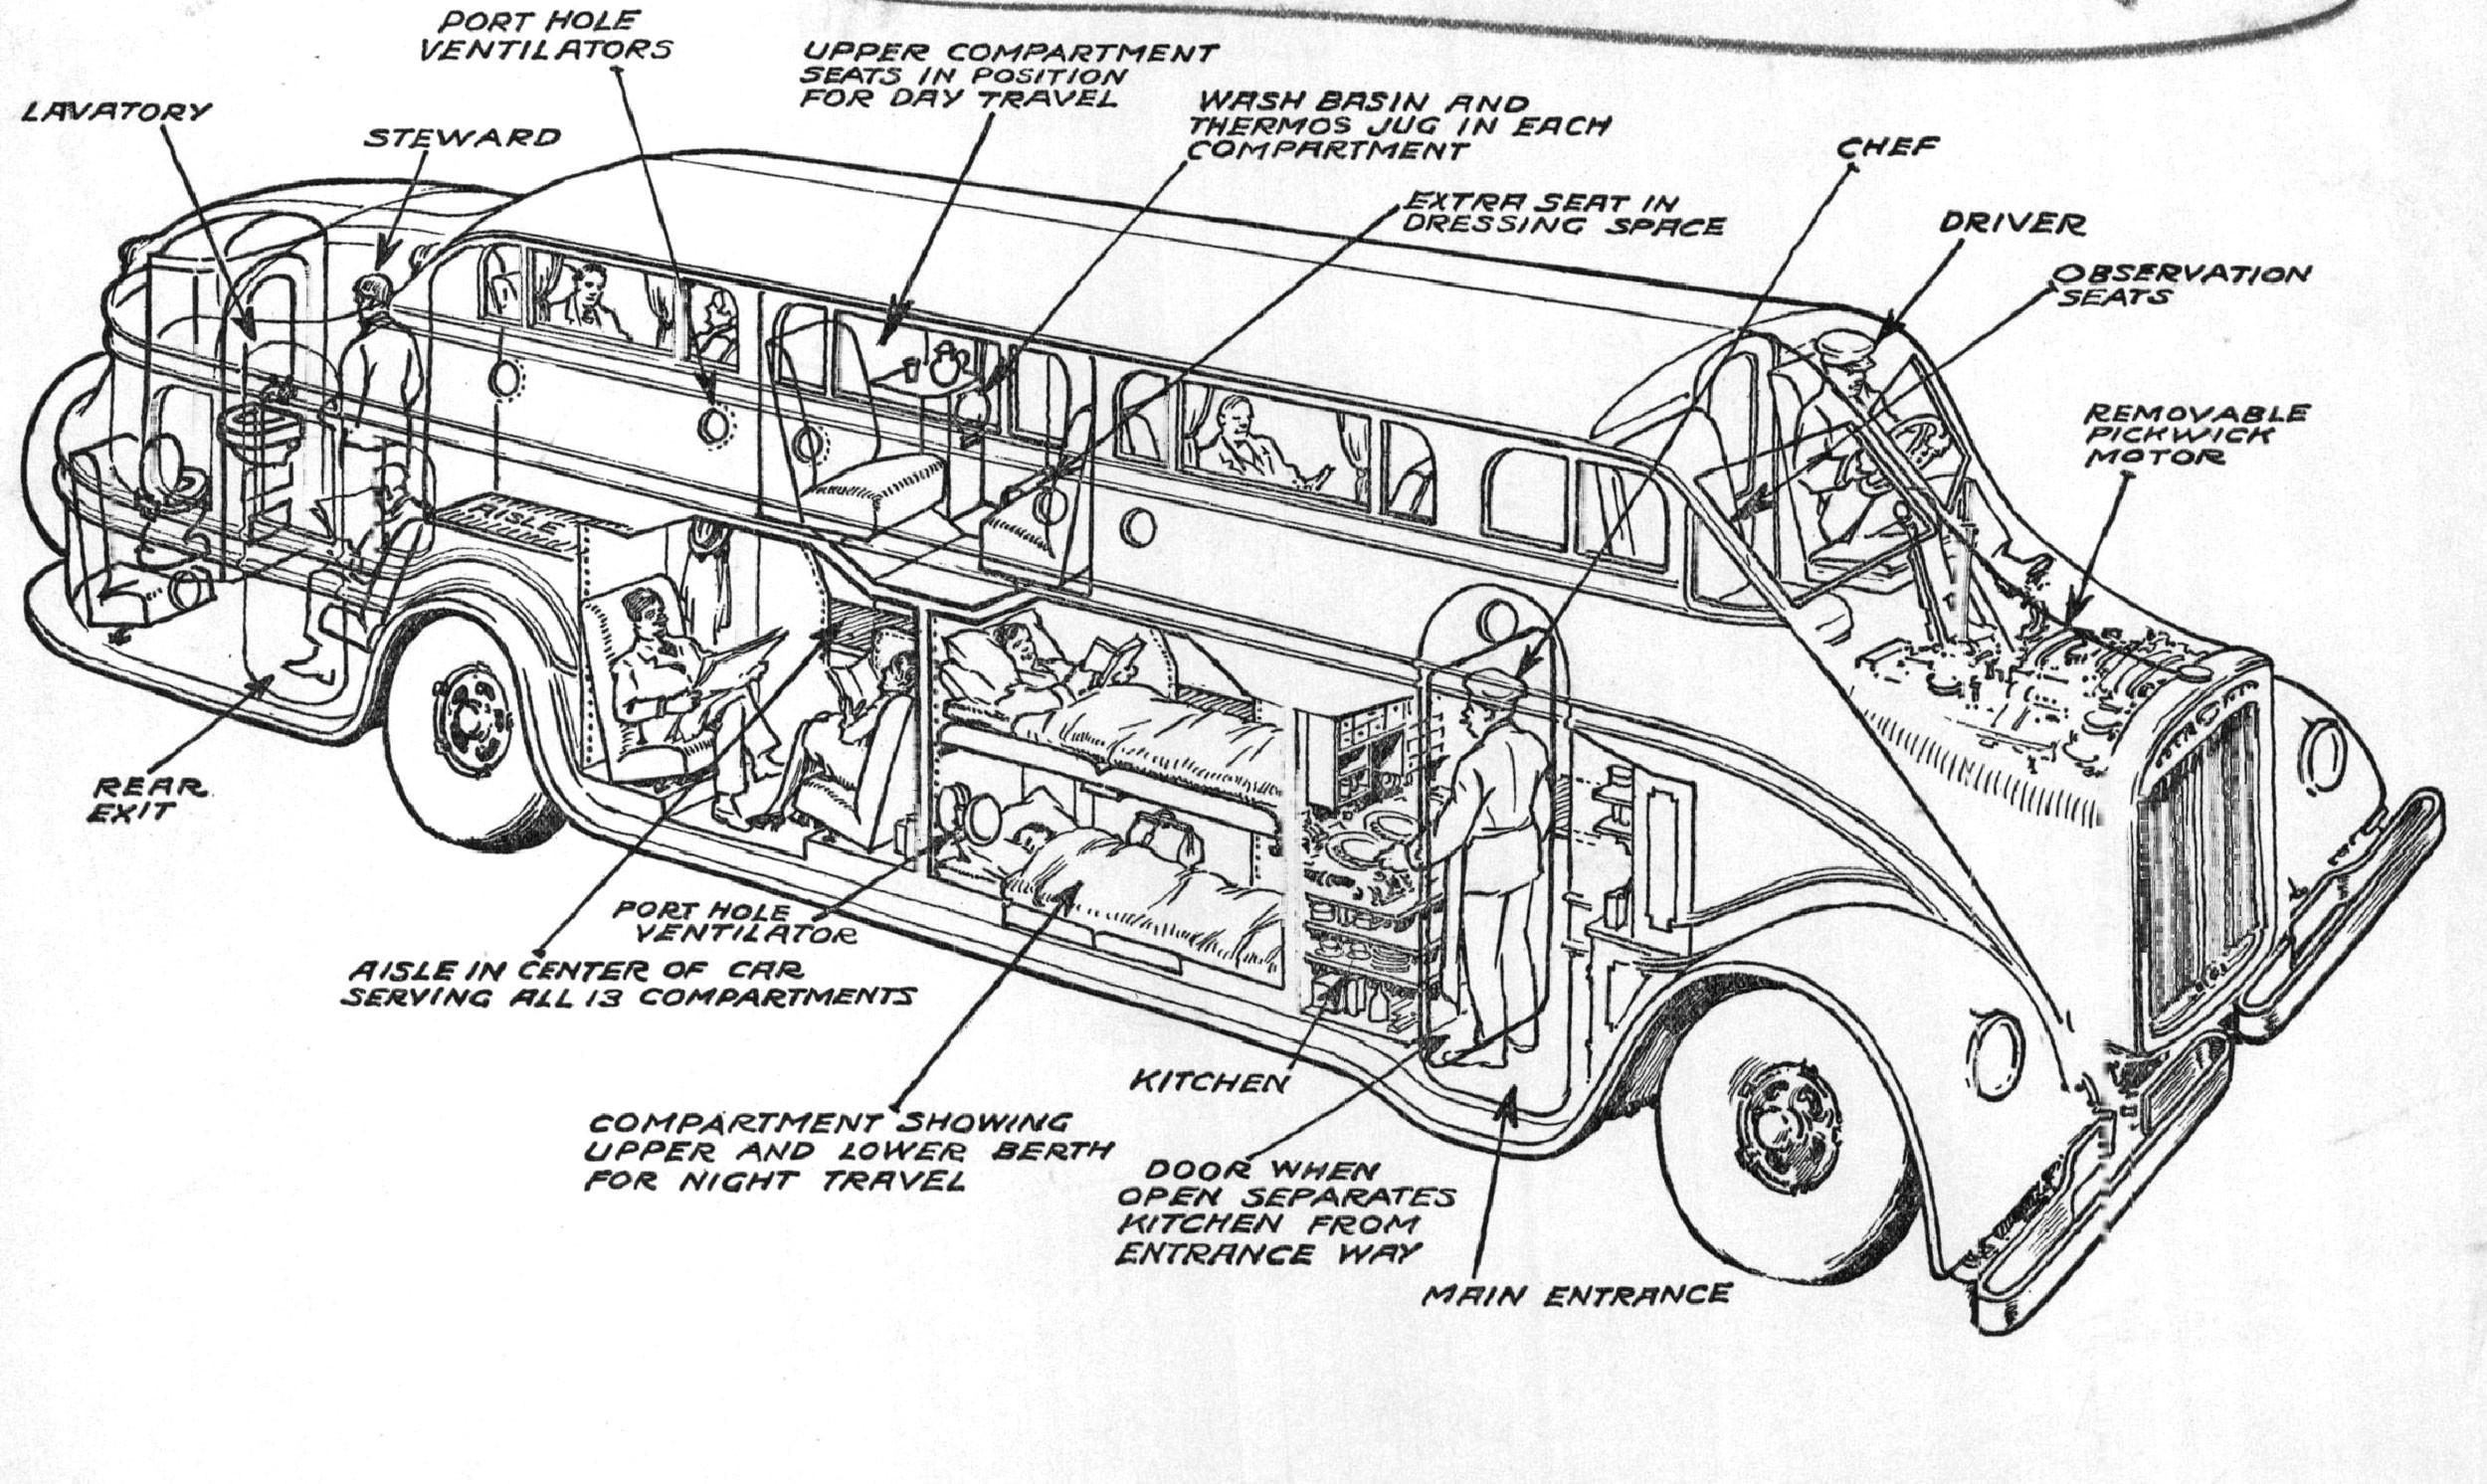 car parts diagram under hood my wiring diagram rh detoxicrecenze com under car parts diagram ford focus under car diagram